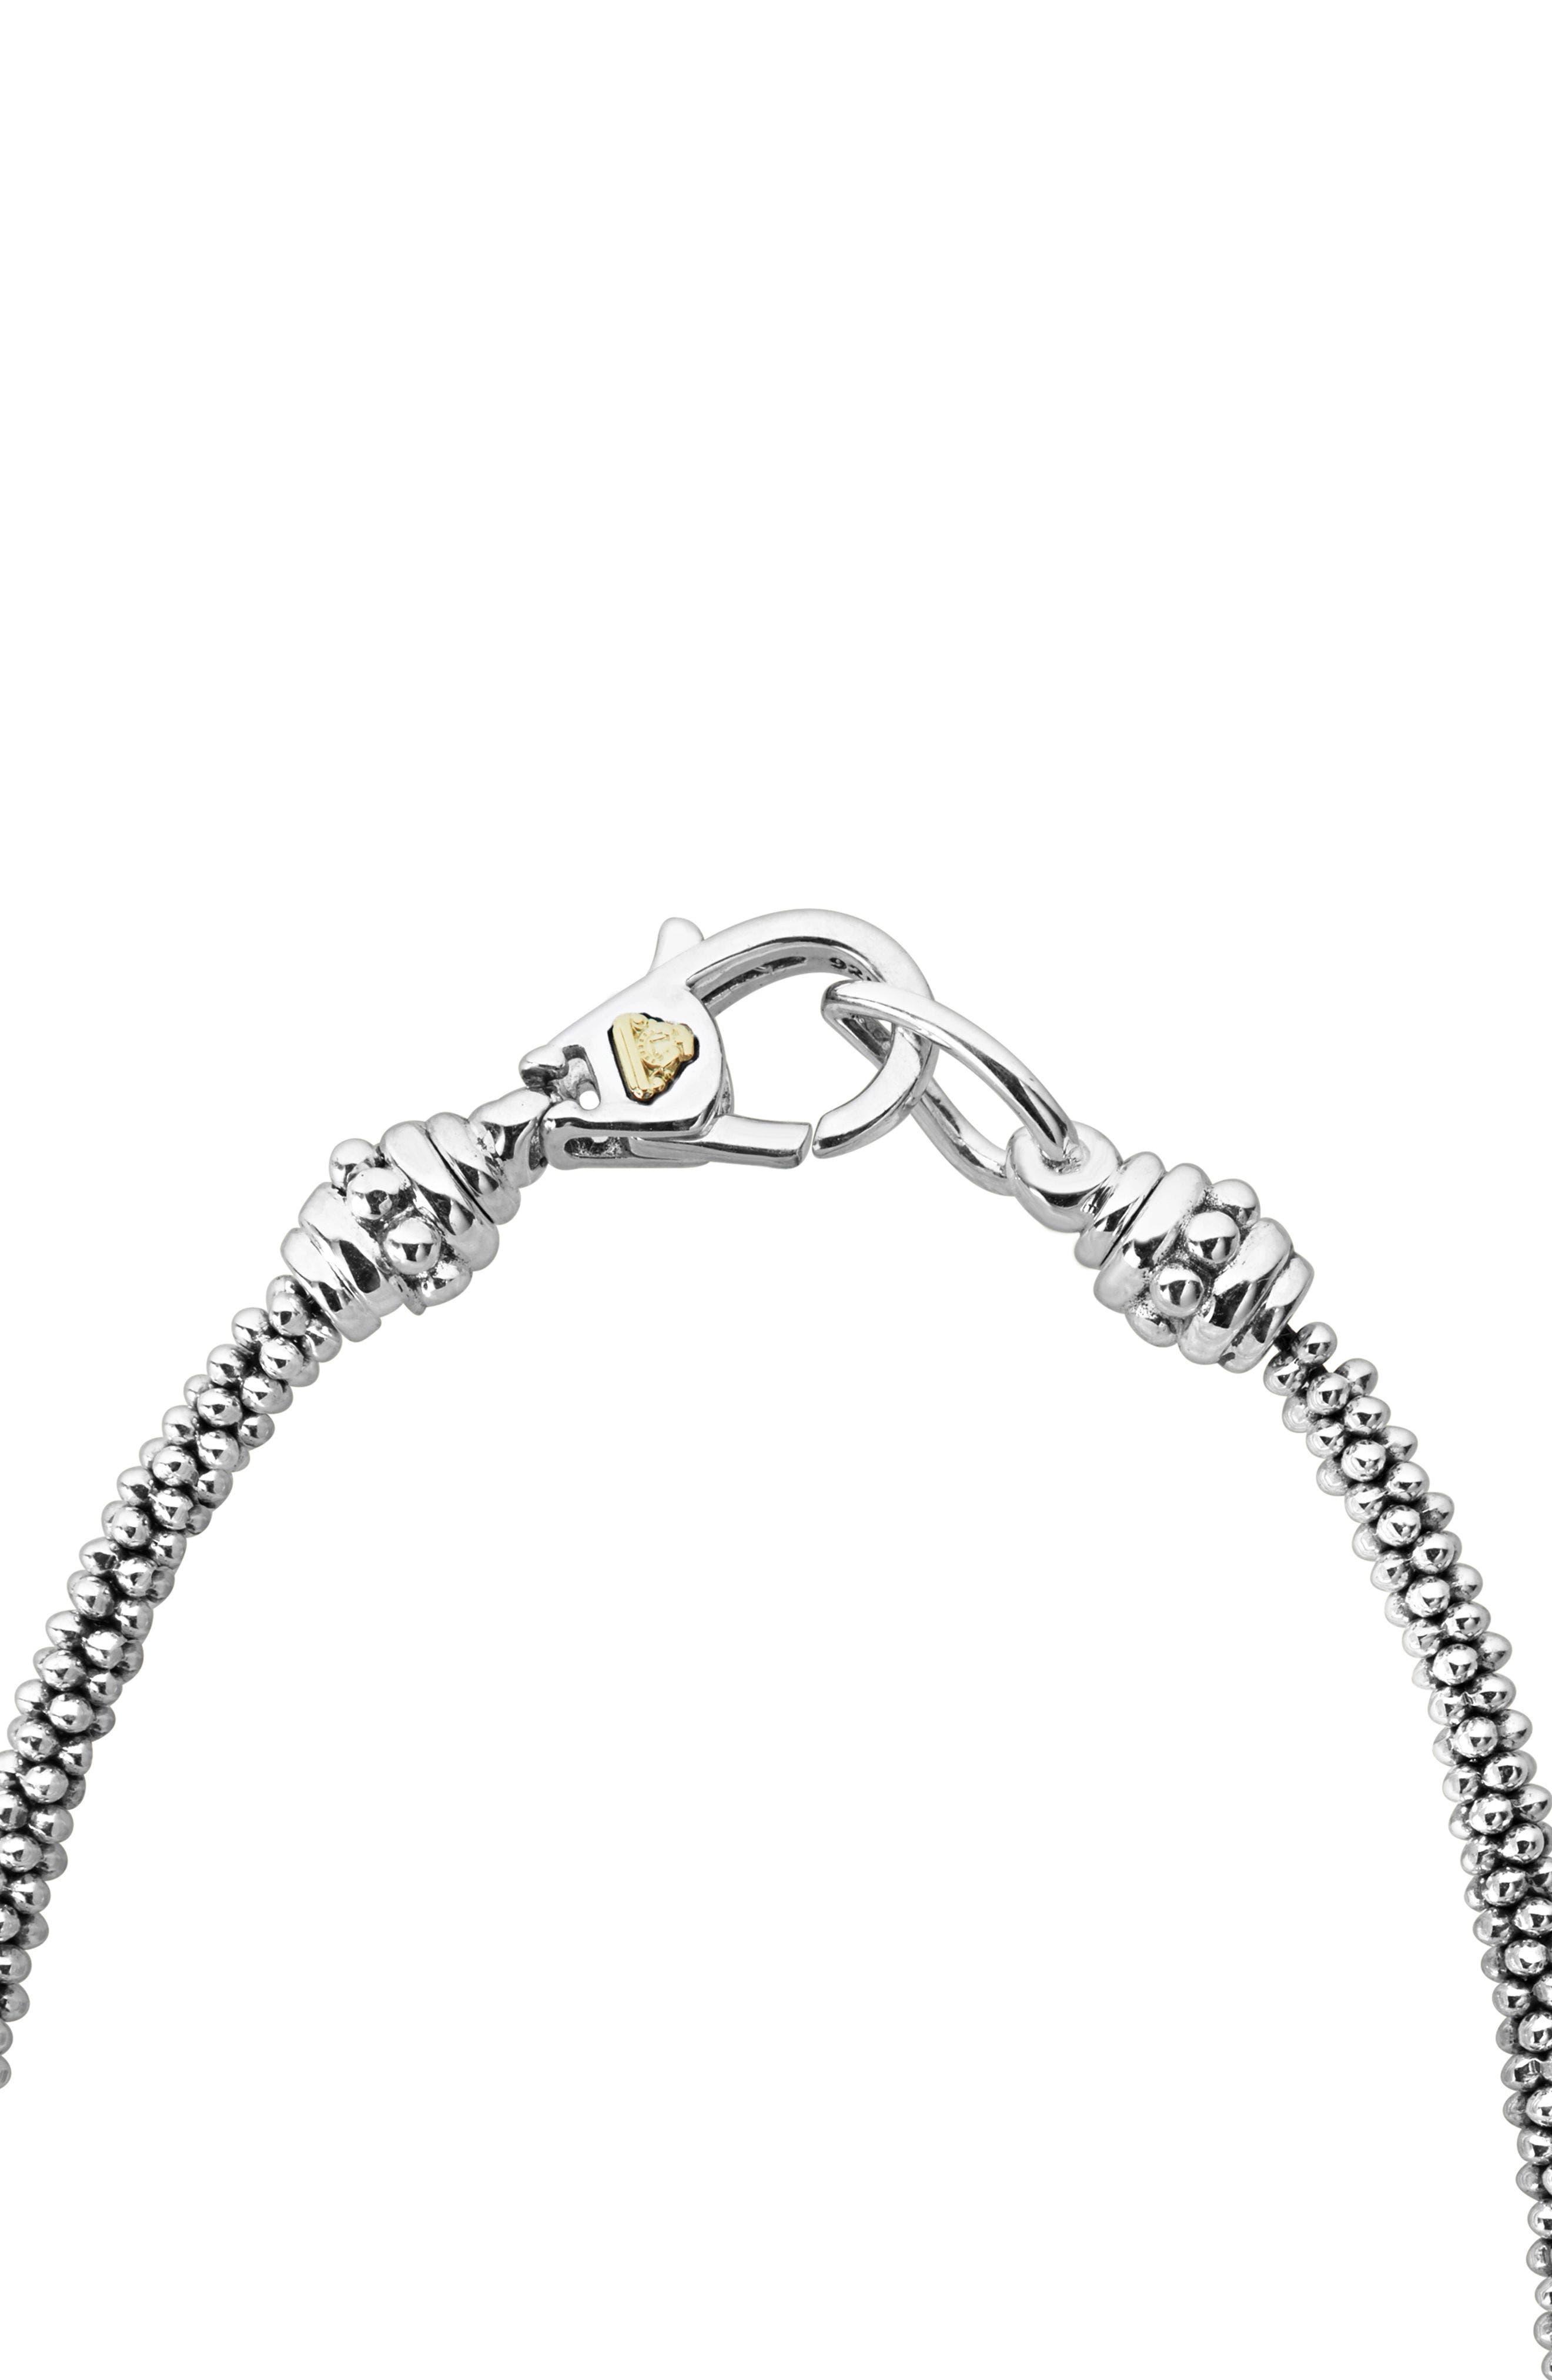 Lux Diamond Rope Necklace,                             Alternate thumbnail 3, color,                             SILVER/ DIAMOND